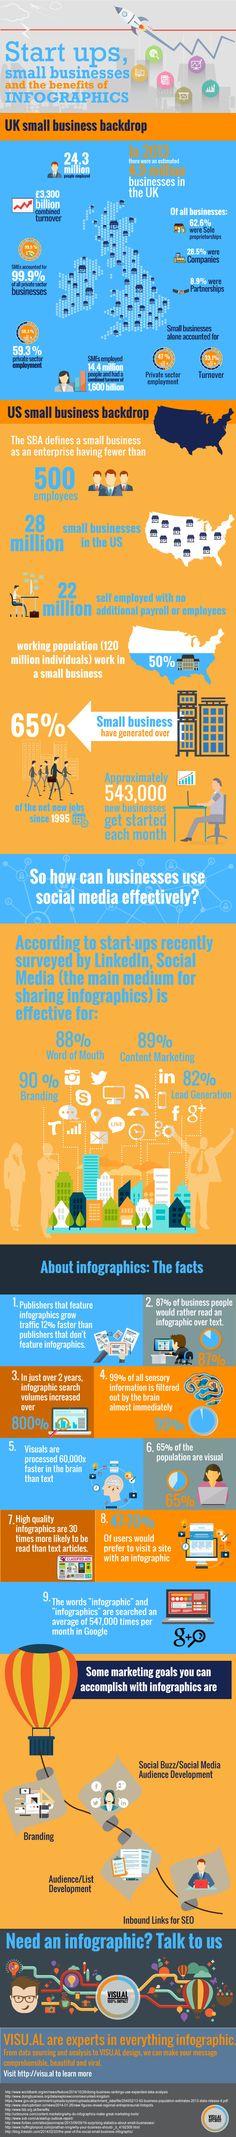 Benefits of #Infographics for Start-ups http://www.visu.al/blog/infographics-for-start-ups/